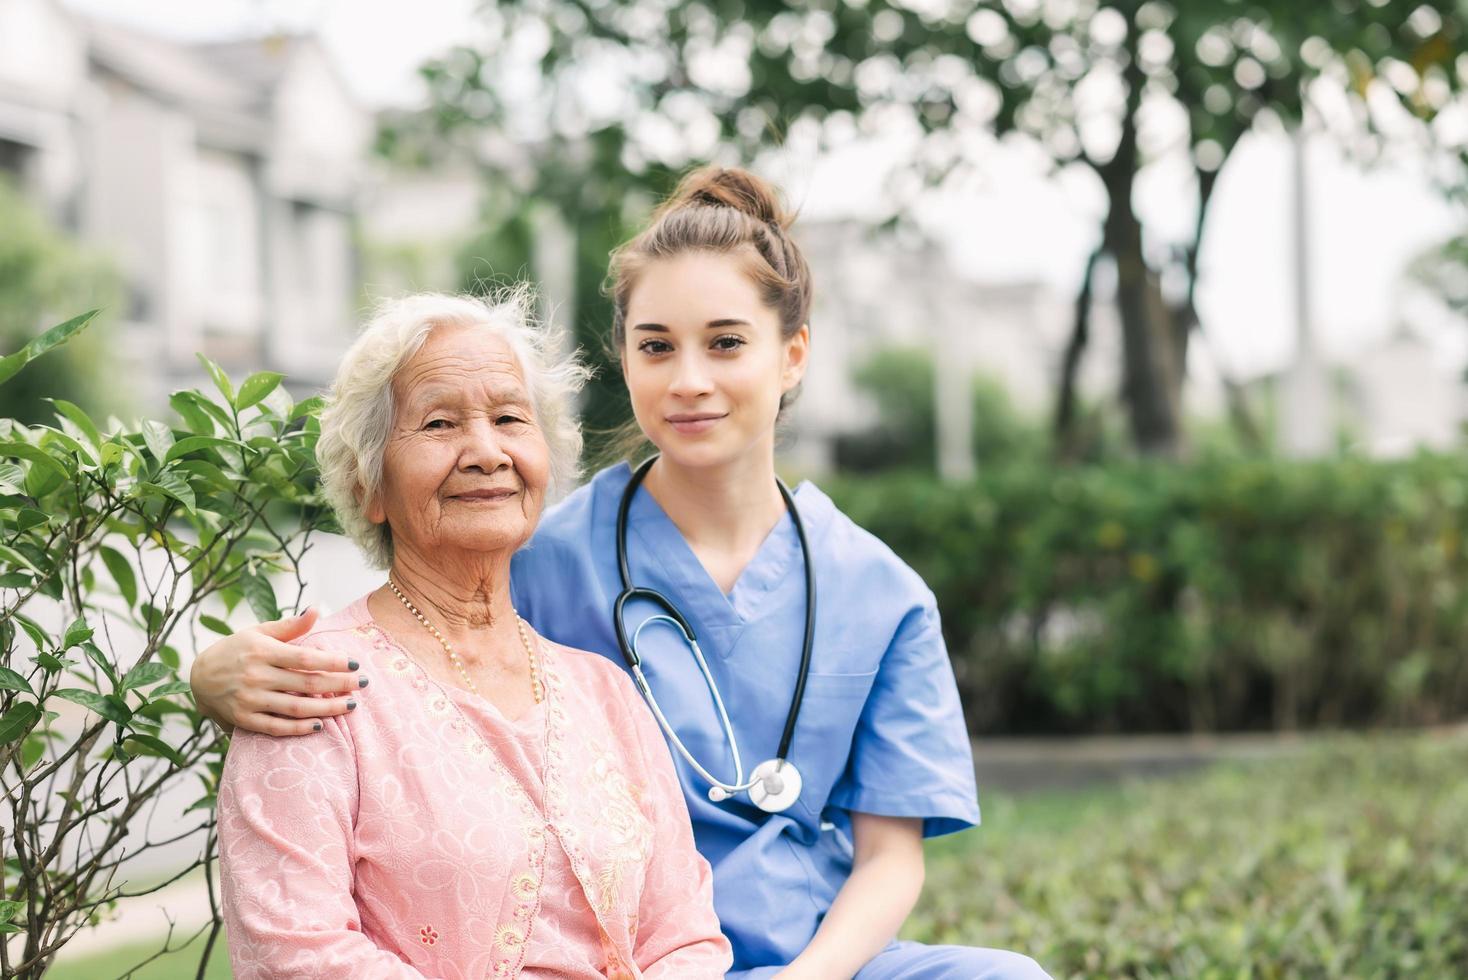 Pflegekraft, die Senior im Park umarmt foto